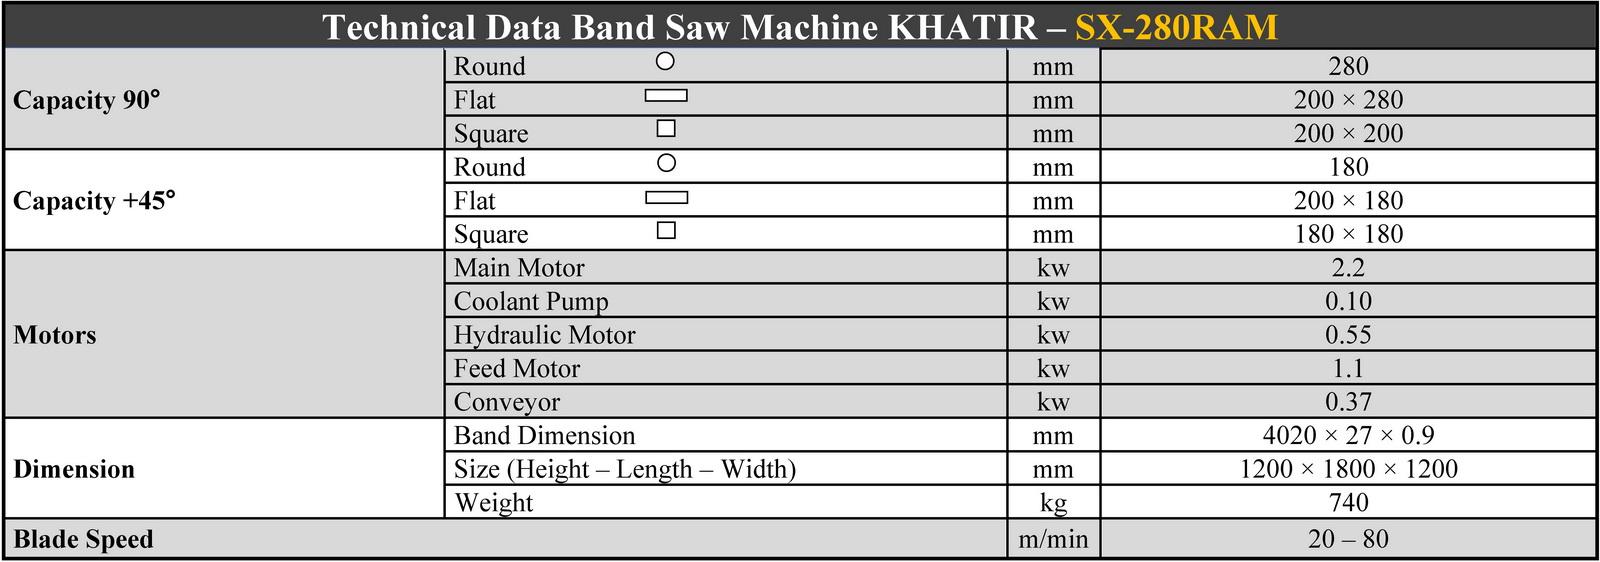 SX 280RAM - مشخصات فنی دستگاه اره نواری بازویی تمام اتوماتیک زاویه زن خطیر